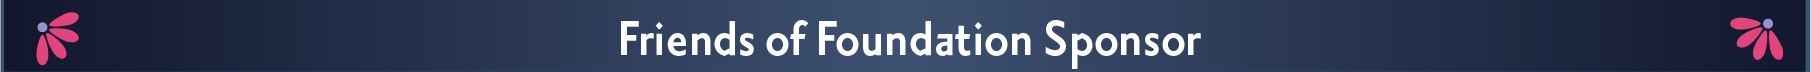 Friends of Foundation Sponsor.png